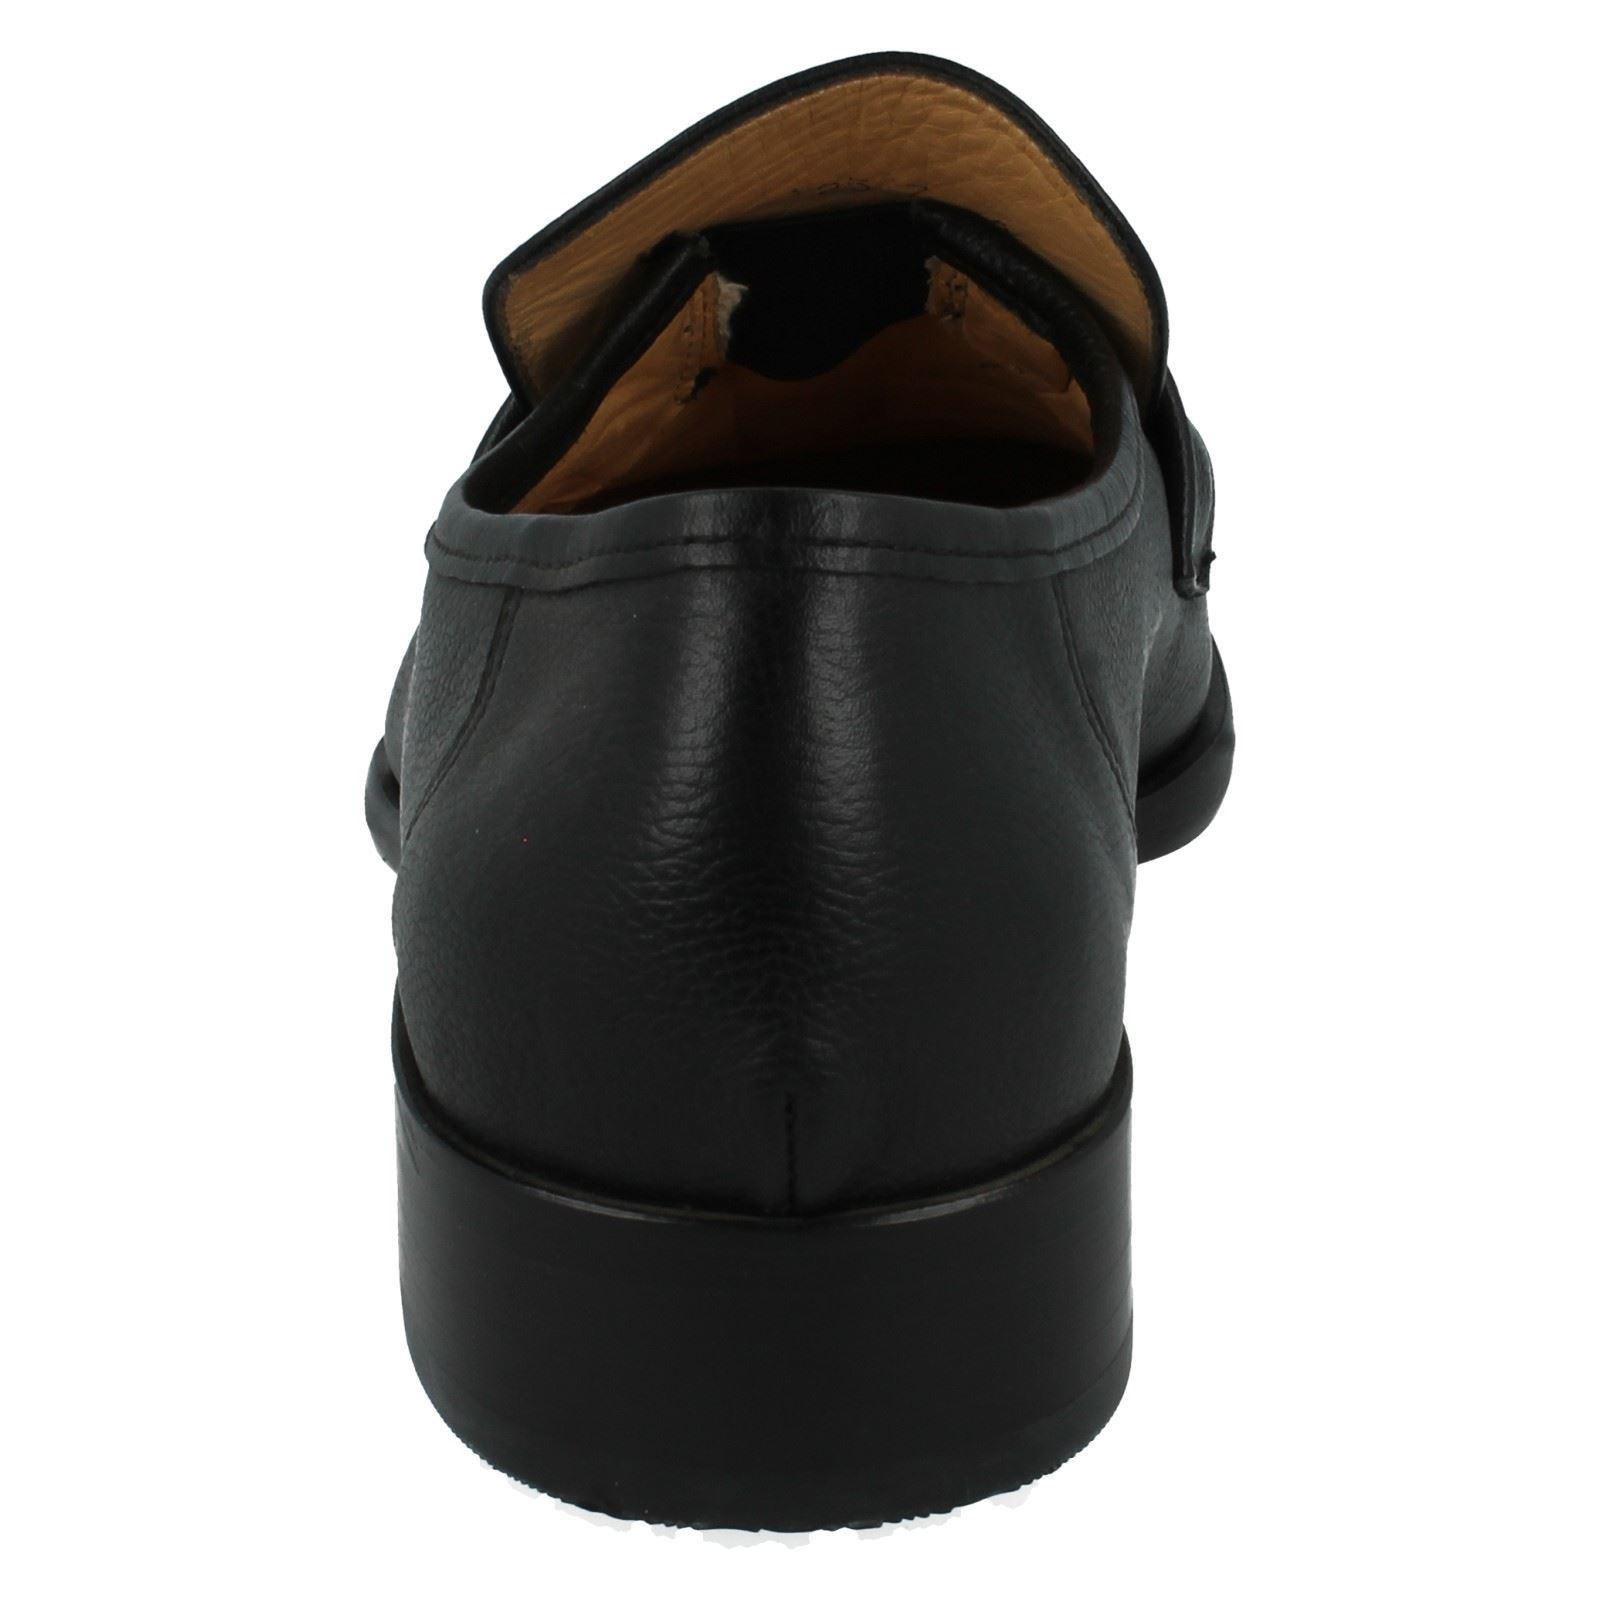 Uomo Schuhes Grenson Loafer Slip On Schuhes Uomo Duke 6df76b